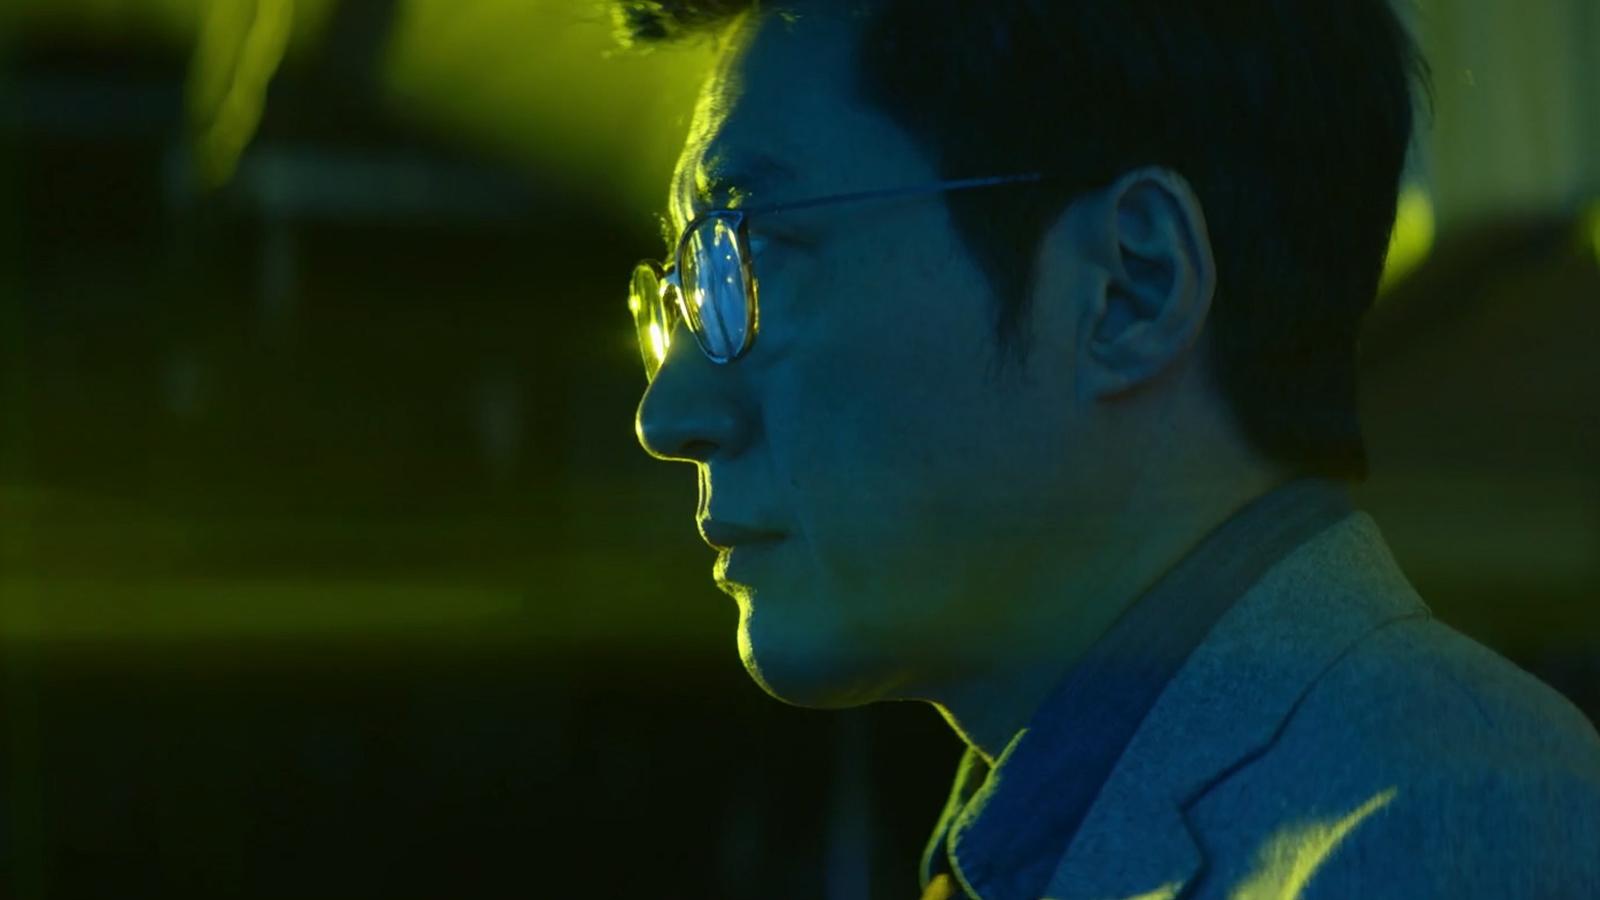 Trailer 1: My Lawyer, Mr. Joe 2: Crime and Punishment